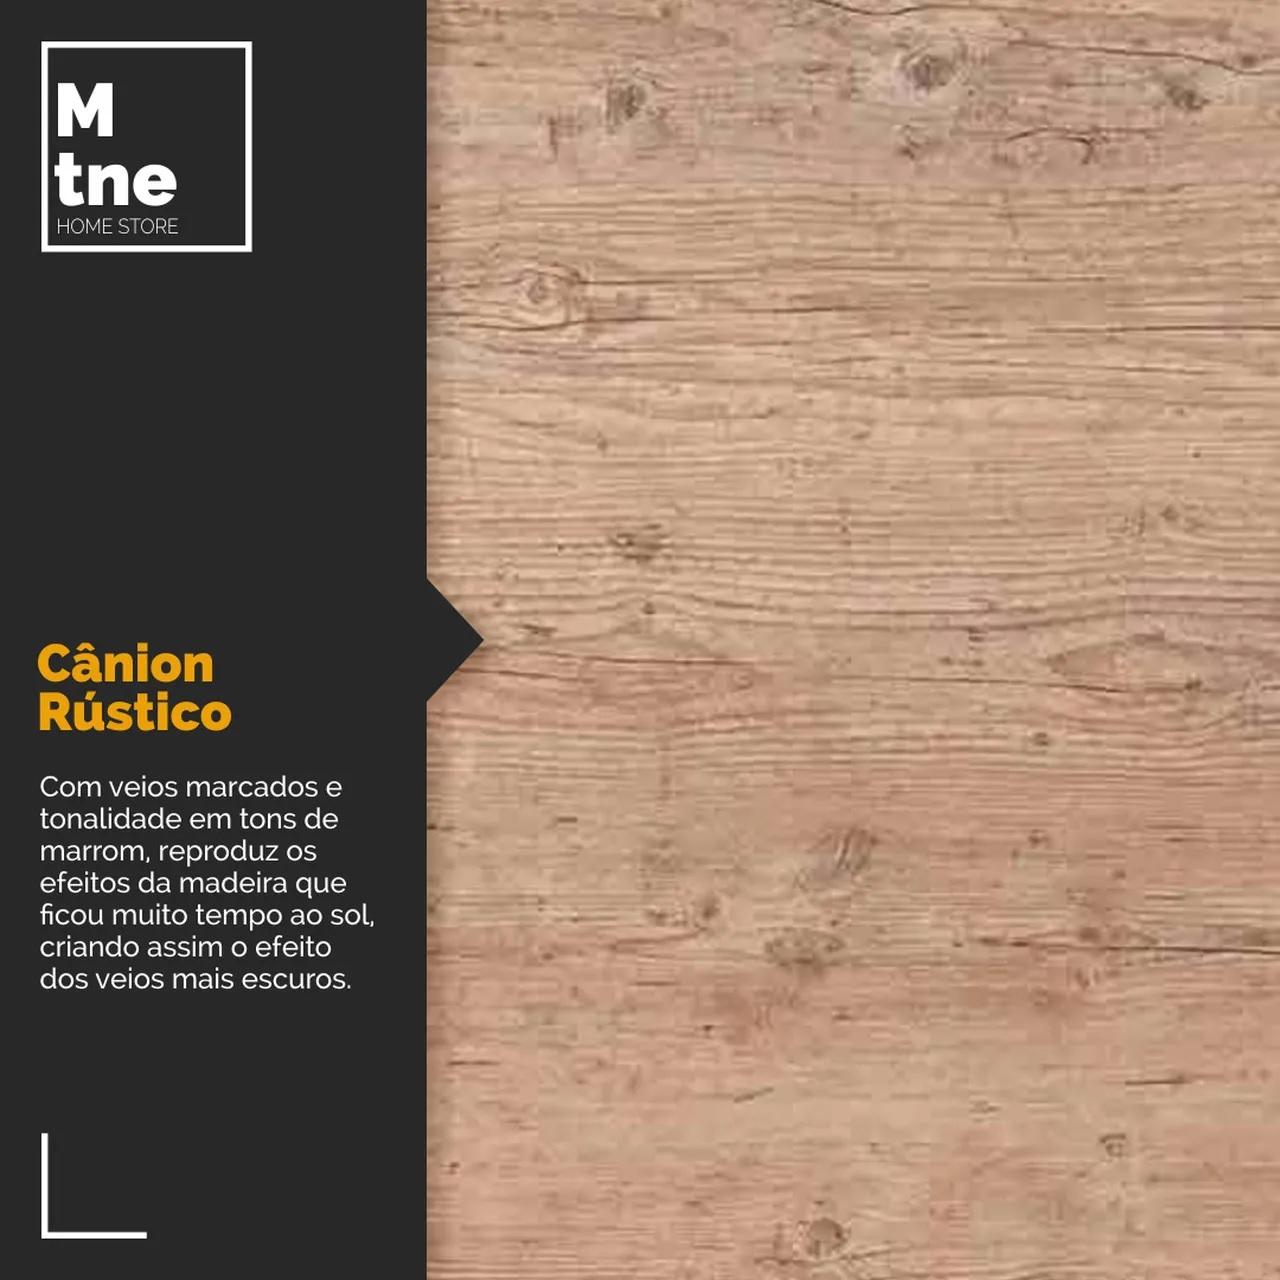 Mesa de Jantar 80x120 e Banco Canion Rustico com Hairpin Legs e Tampo 100% MDF  - Mtne Store